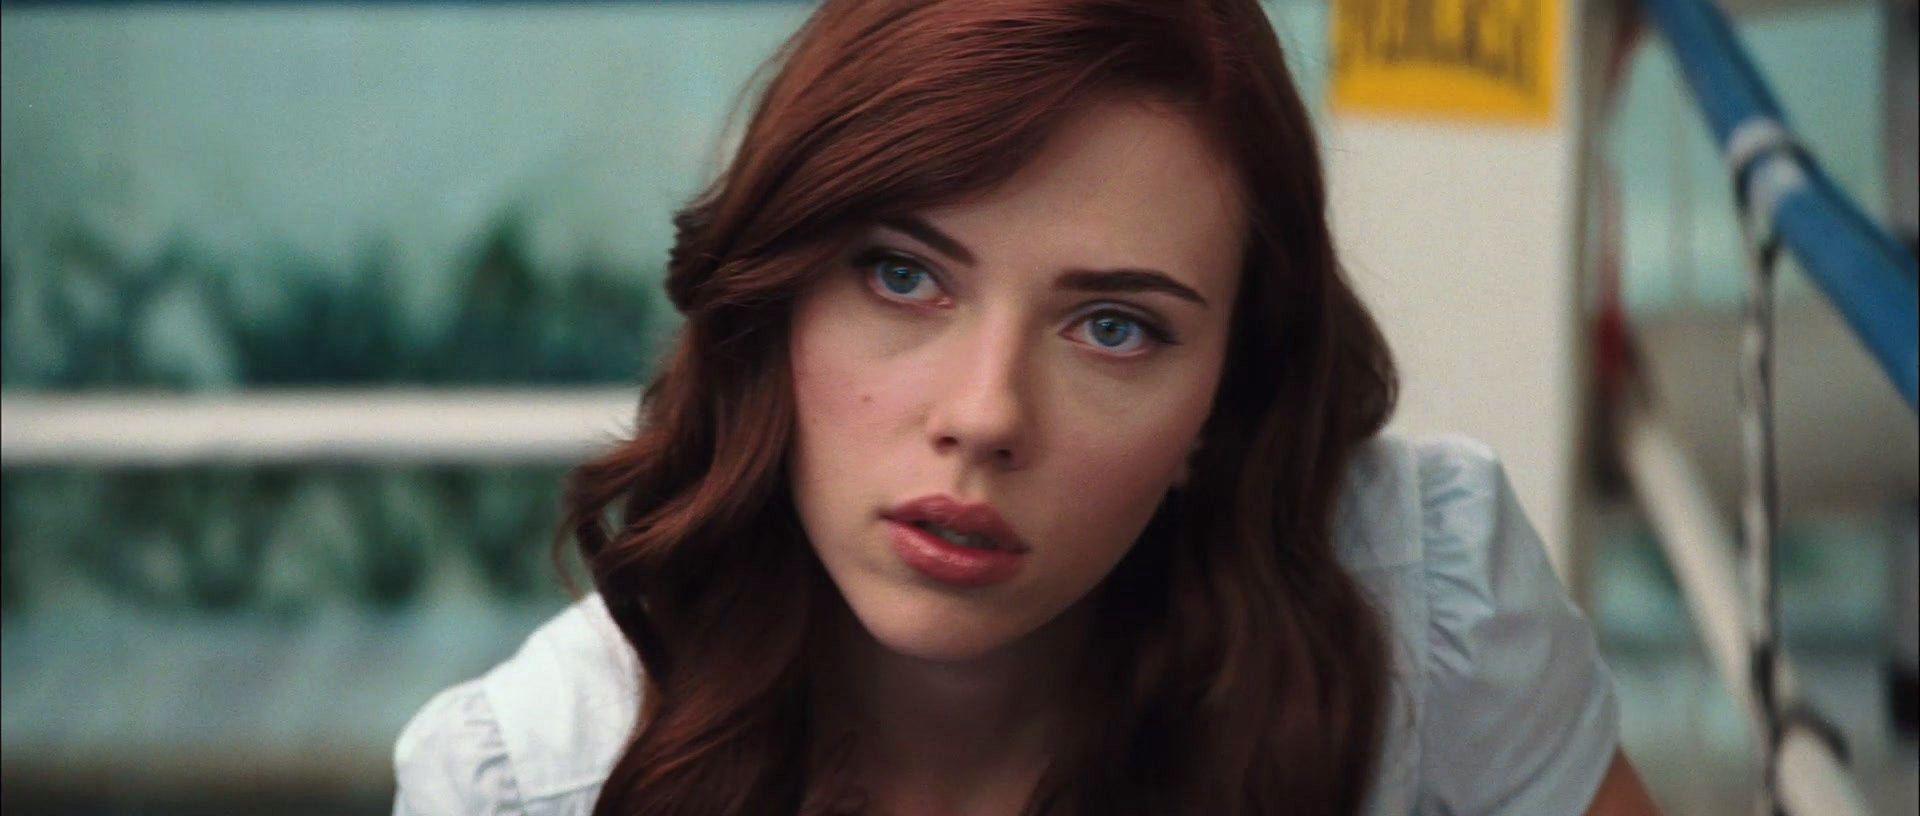 http://images2.fanpop.com/image/photos/9500000/Scarlett-Johansson-Iron-Man-2-Trailer-Screencaps-scarlett-johansson-9587642-1920-816.jpg